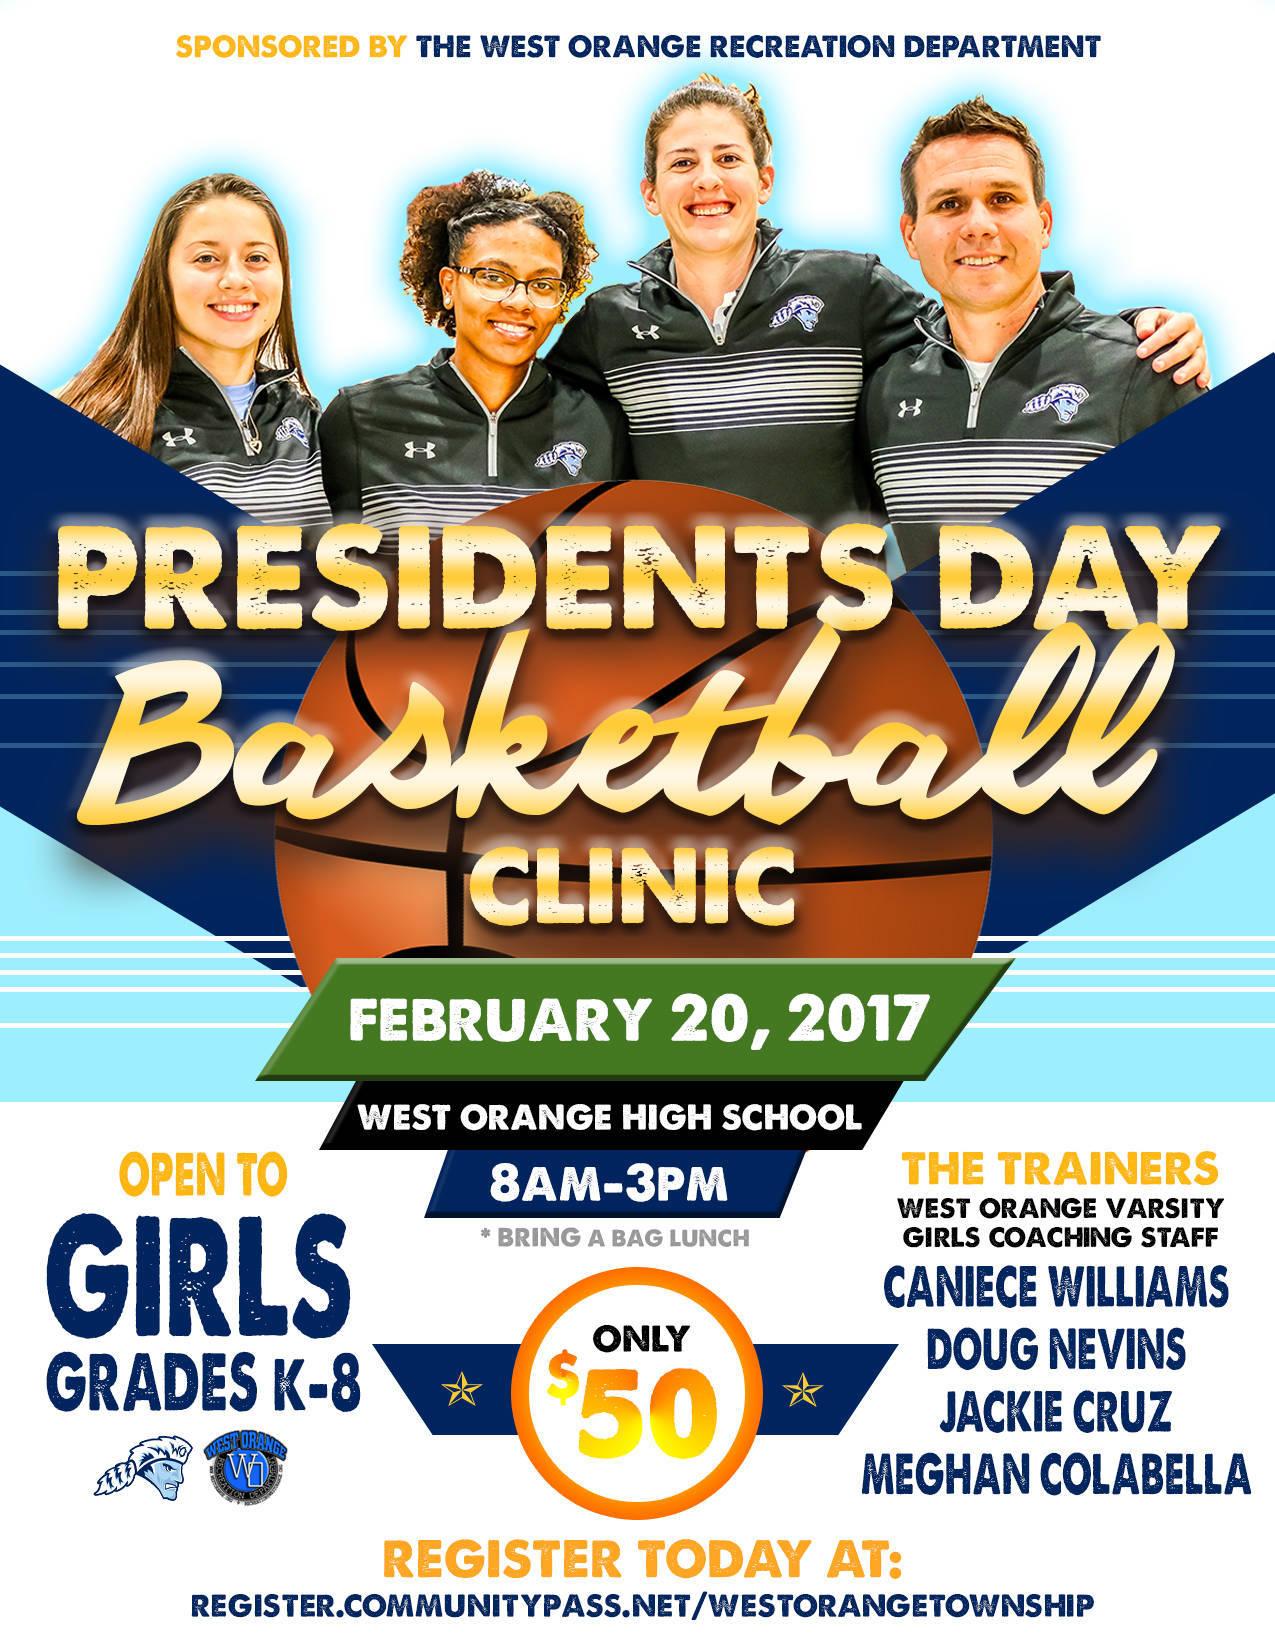 6da63ef5015ab3fc513e_2017-Presidents-Day-BBall-Clinic-Color.jpg